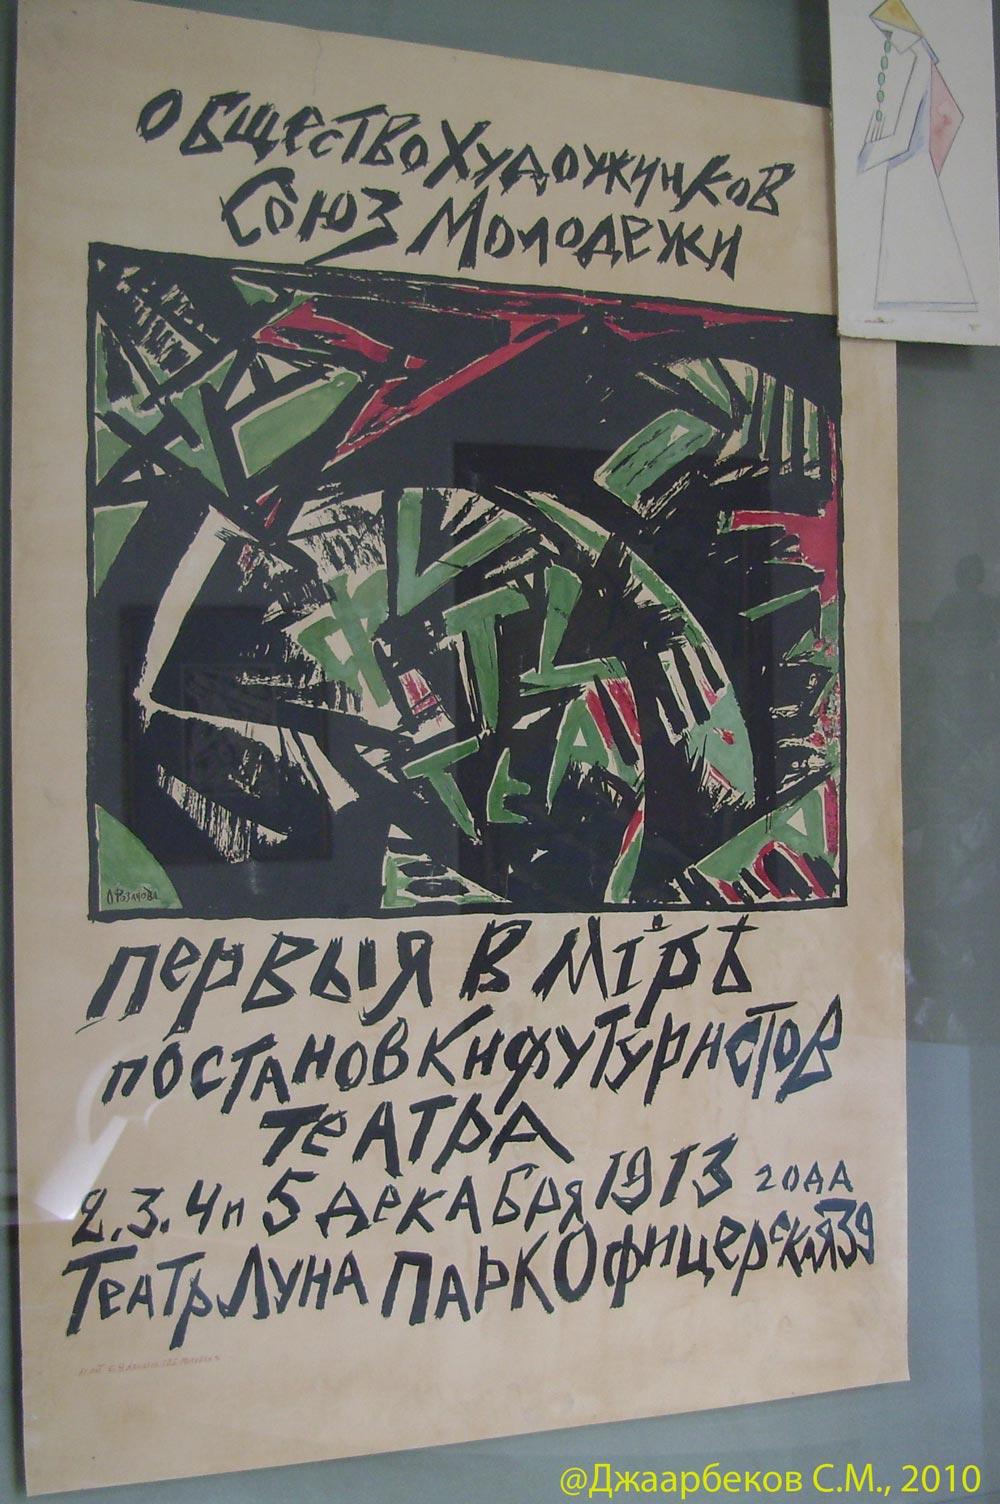 фото футуристов серебряного века